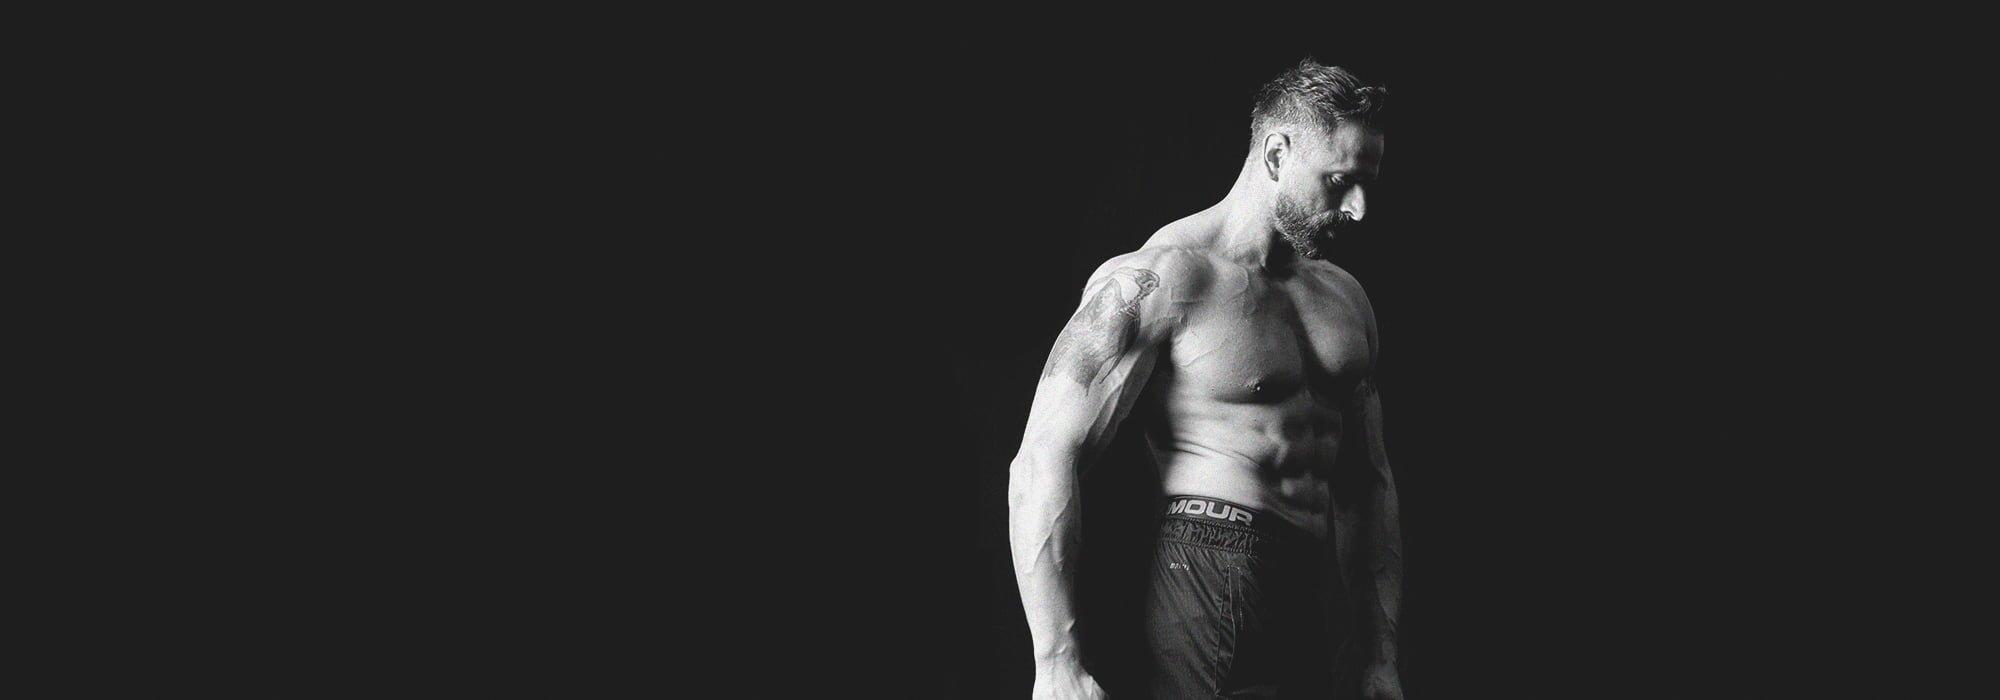 DIET NEUROTYPE 2B FAT LOSS